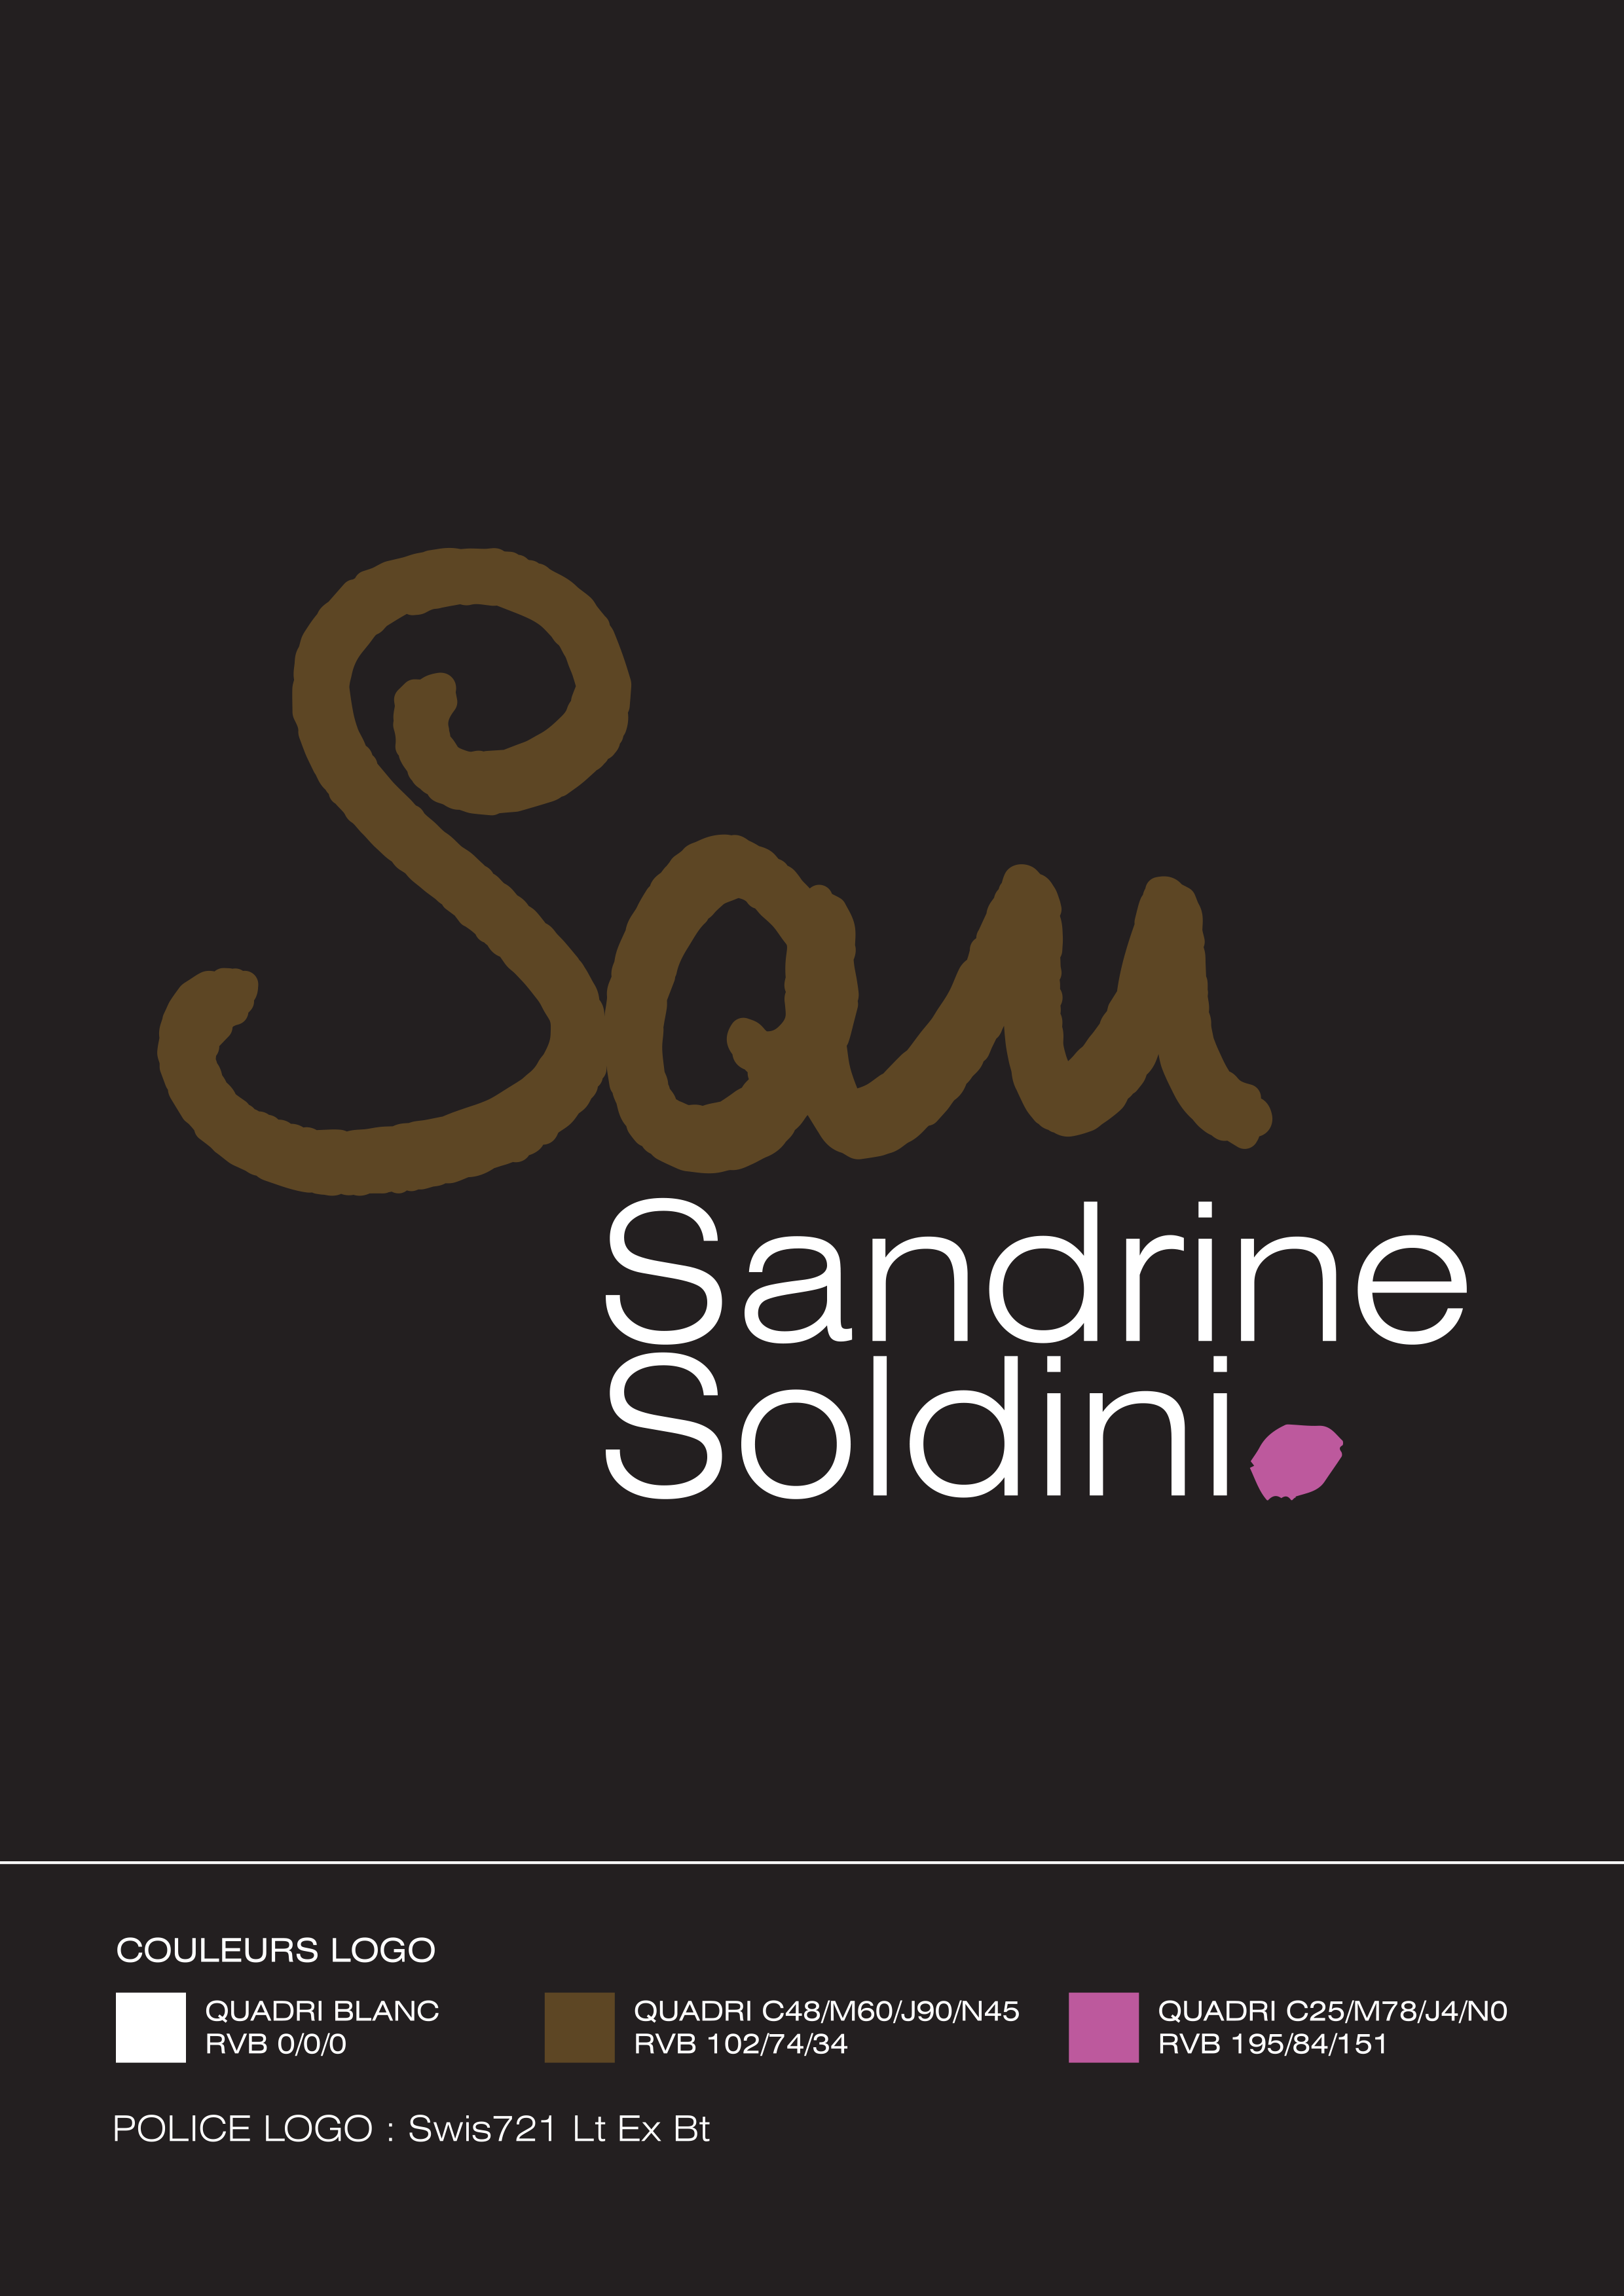 Sandrine Soldini